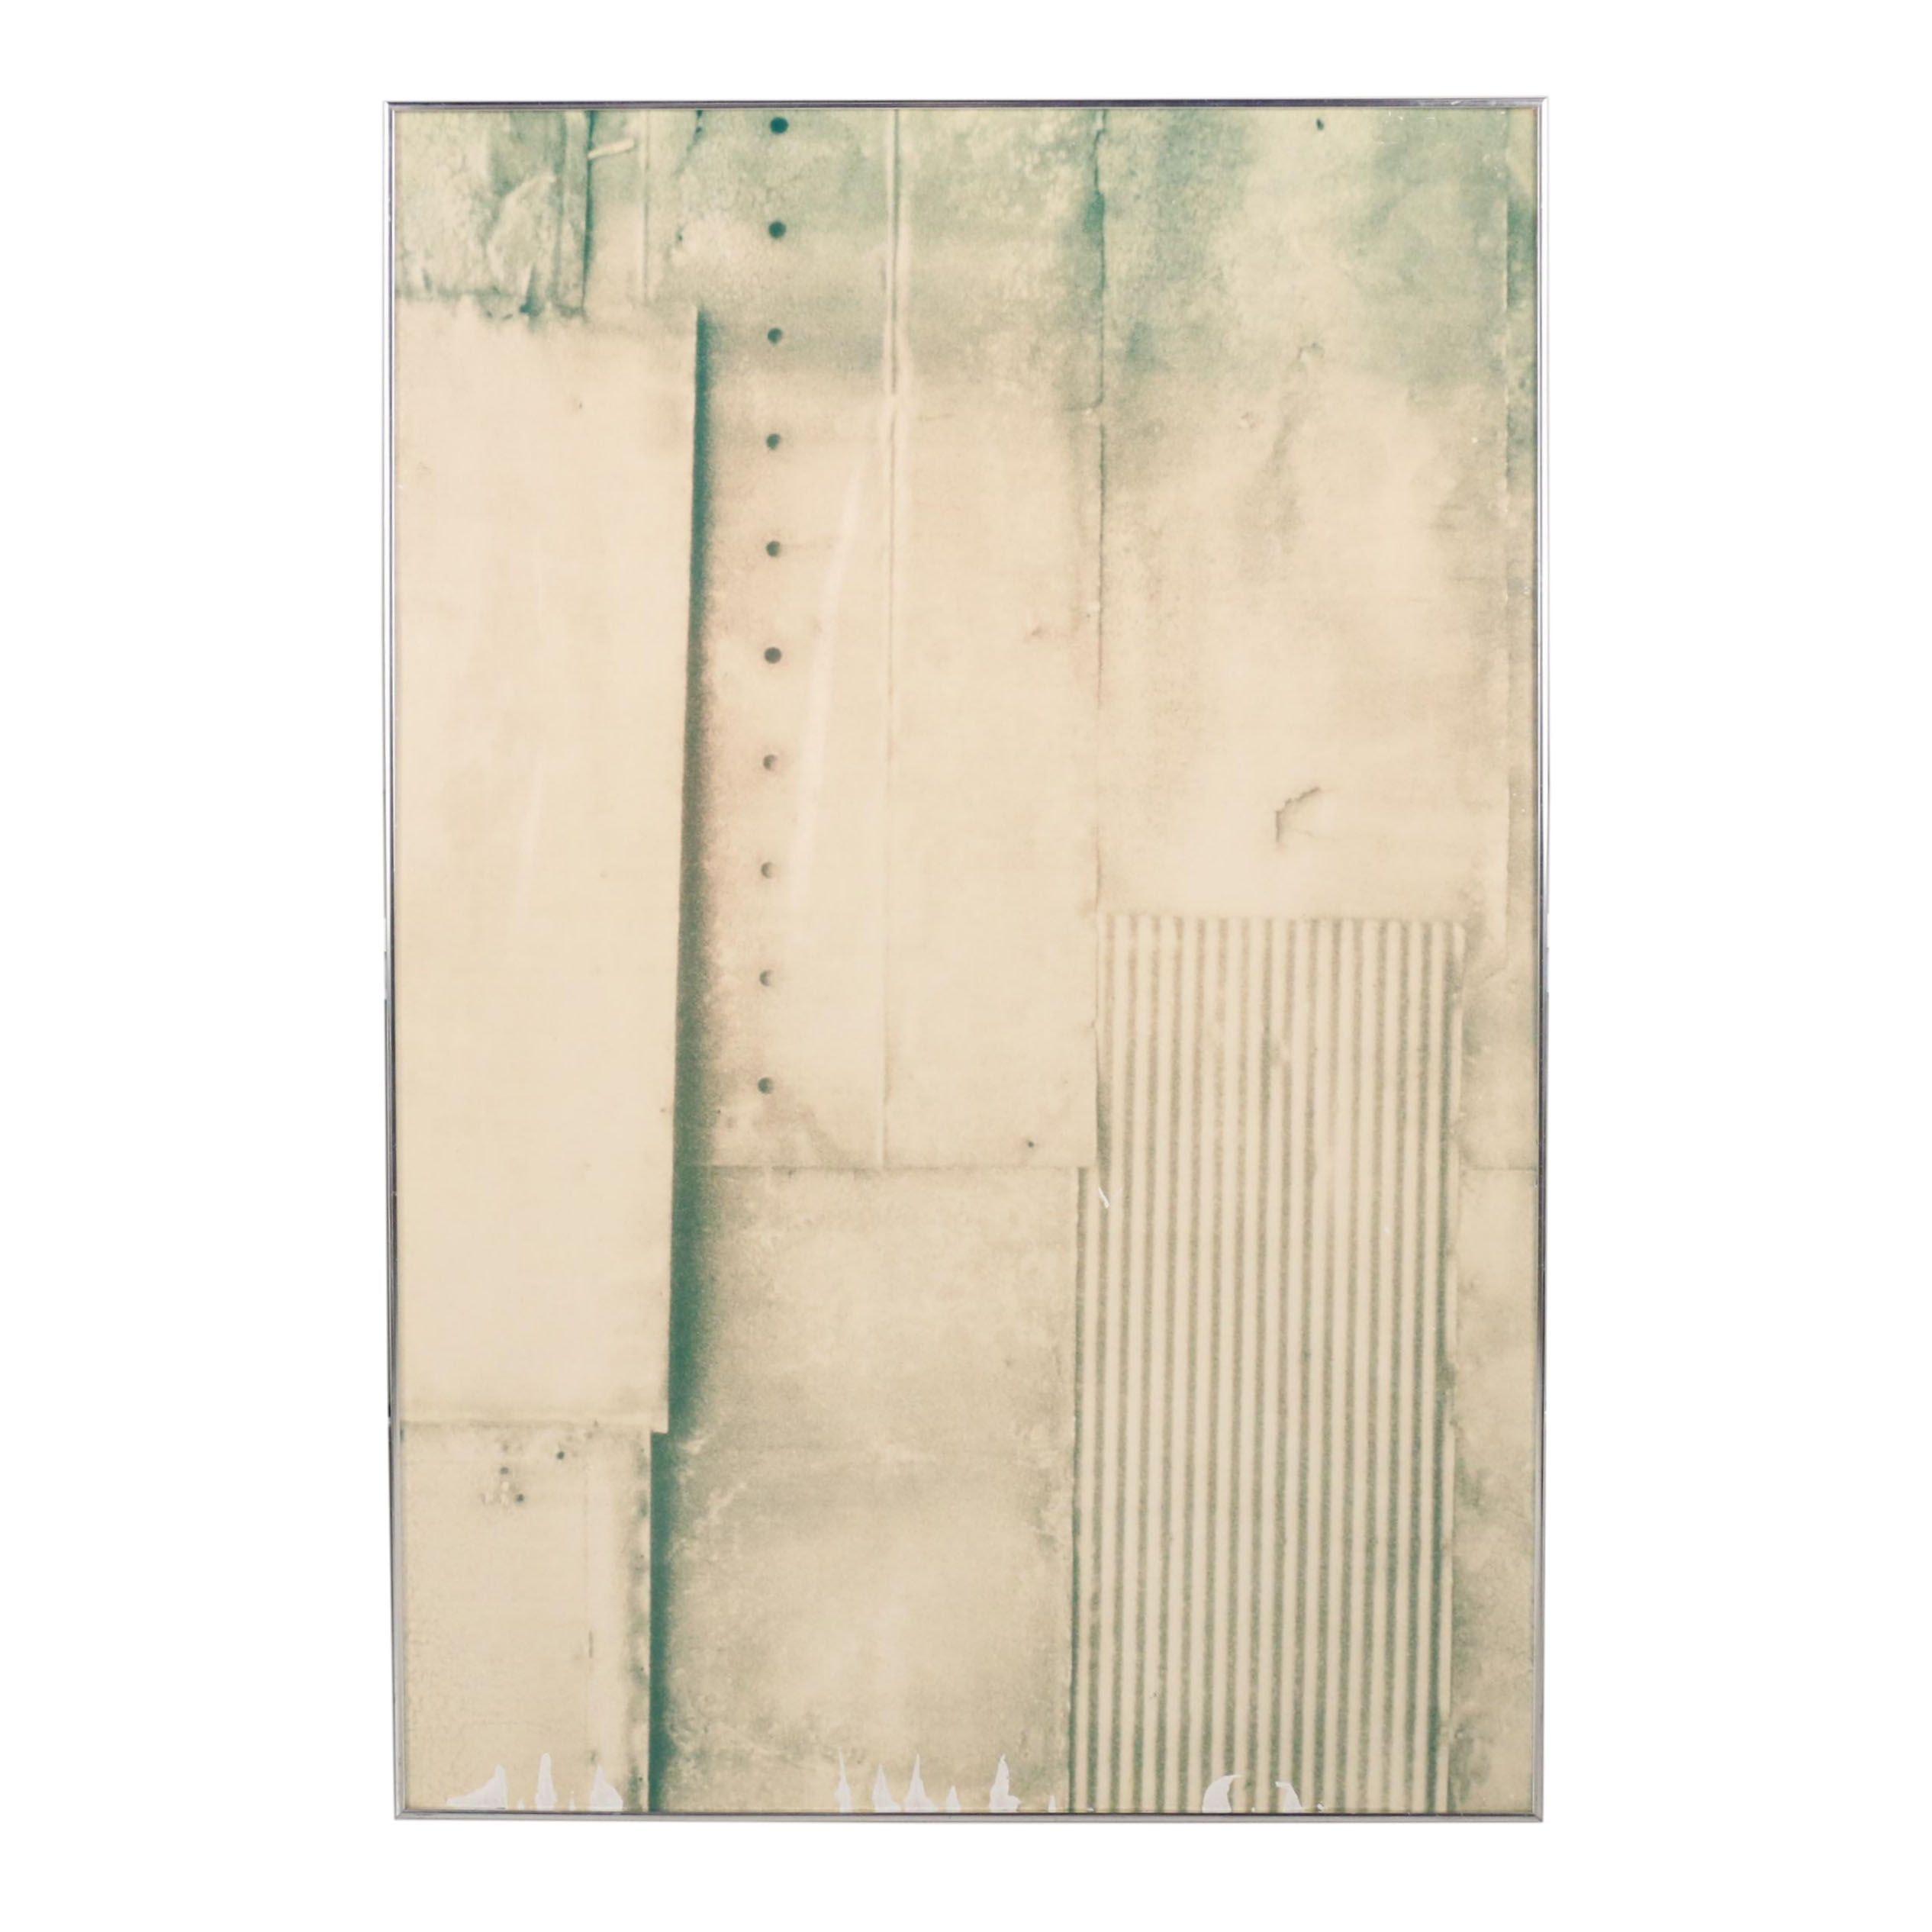 Silver Gelatin Print after Howard Dearstyne